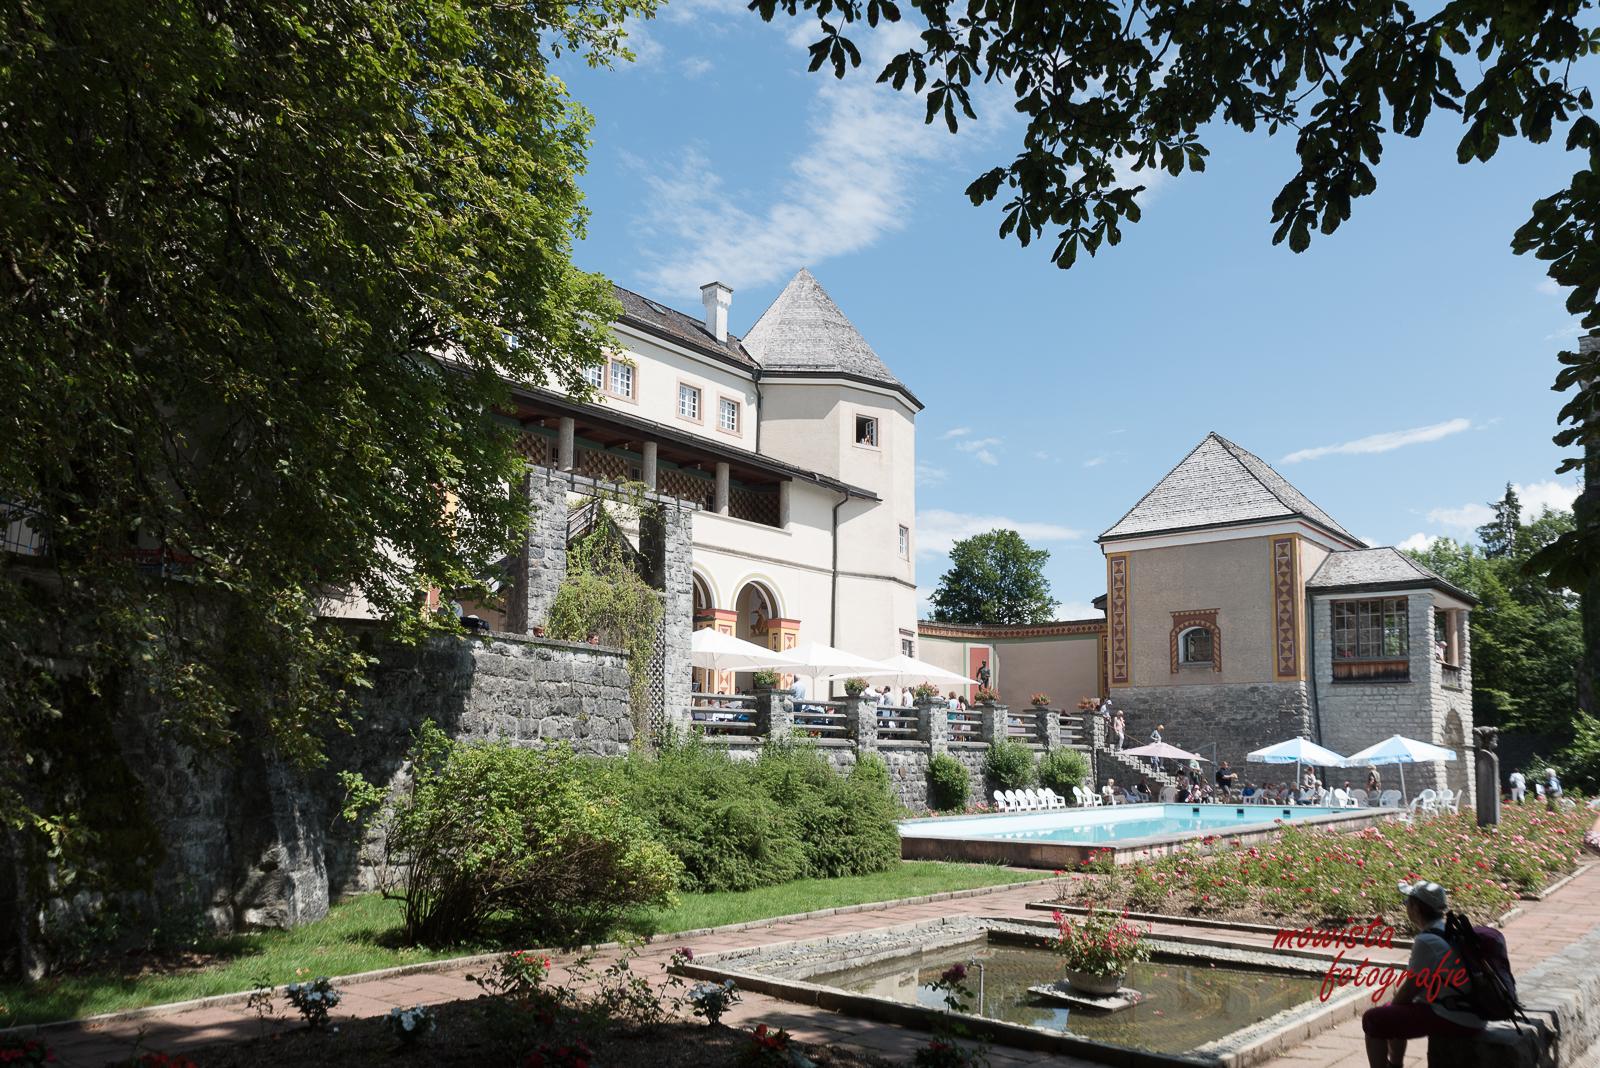 20170722_MW_DSC_5749_Schloss Ringberg